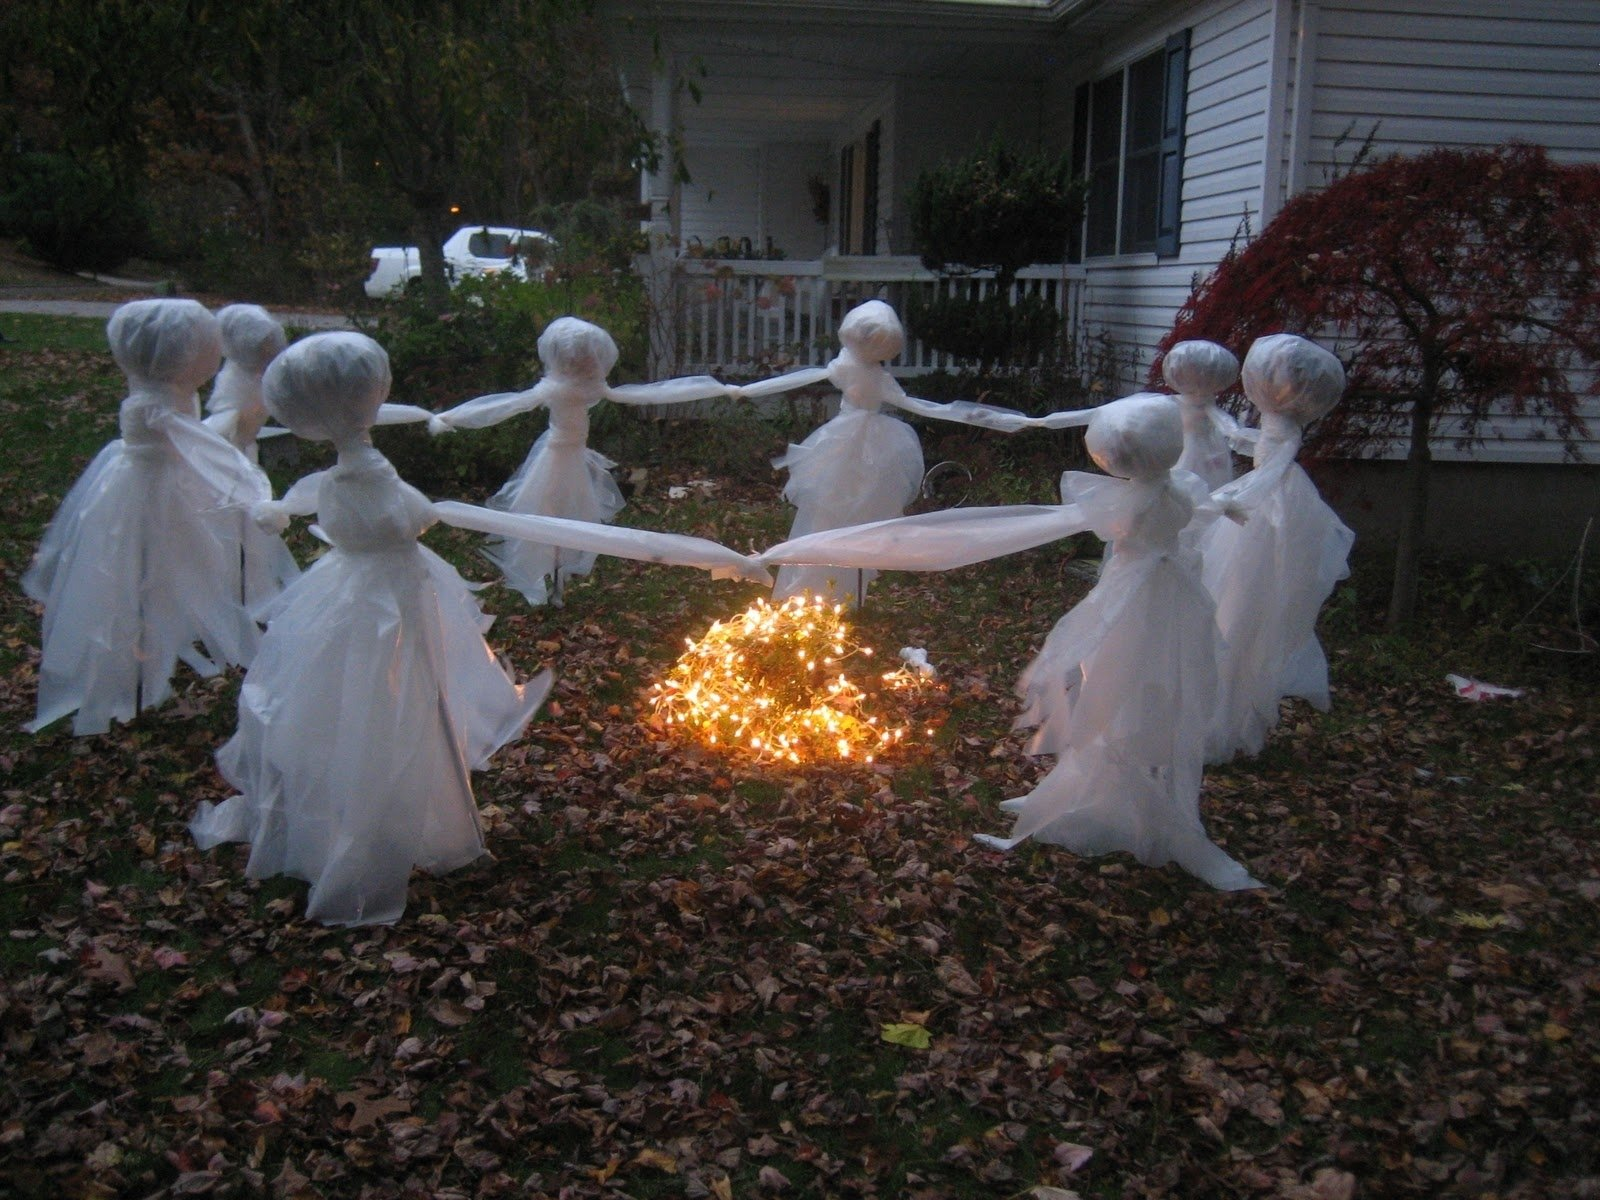 10 Nice Halloween Decoration Ideas For Yard 11 easy diy halloween decorations with trash bags diy halloween 2020